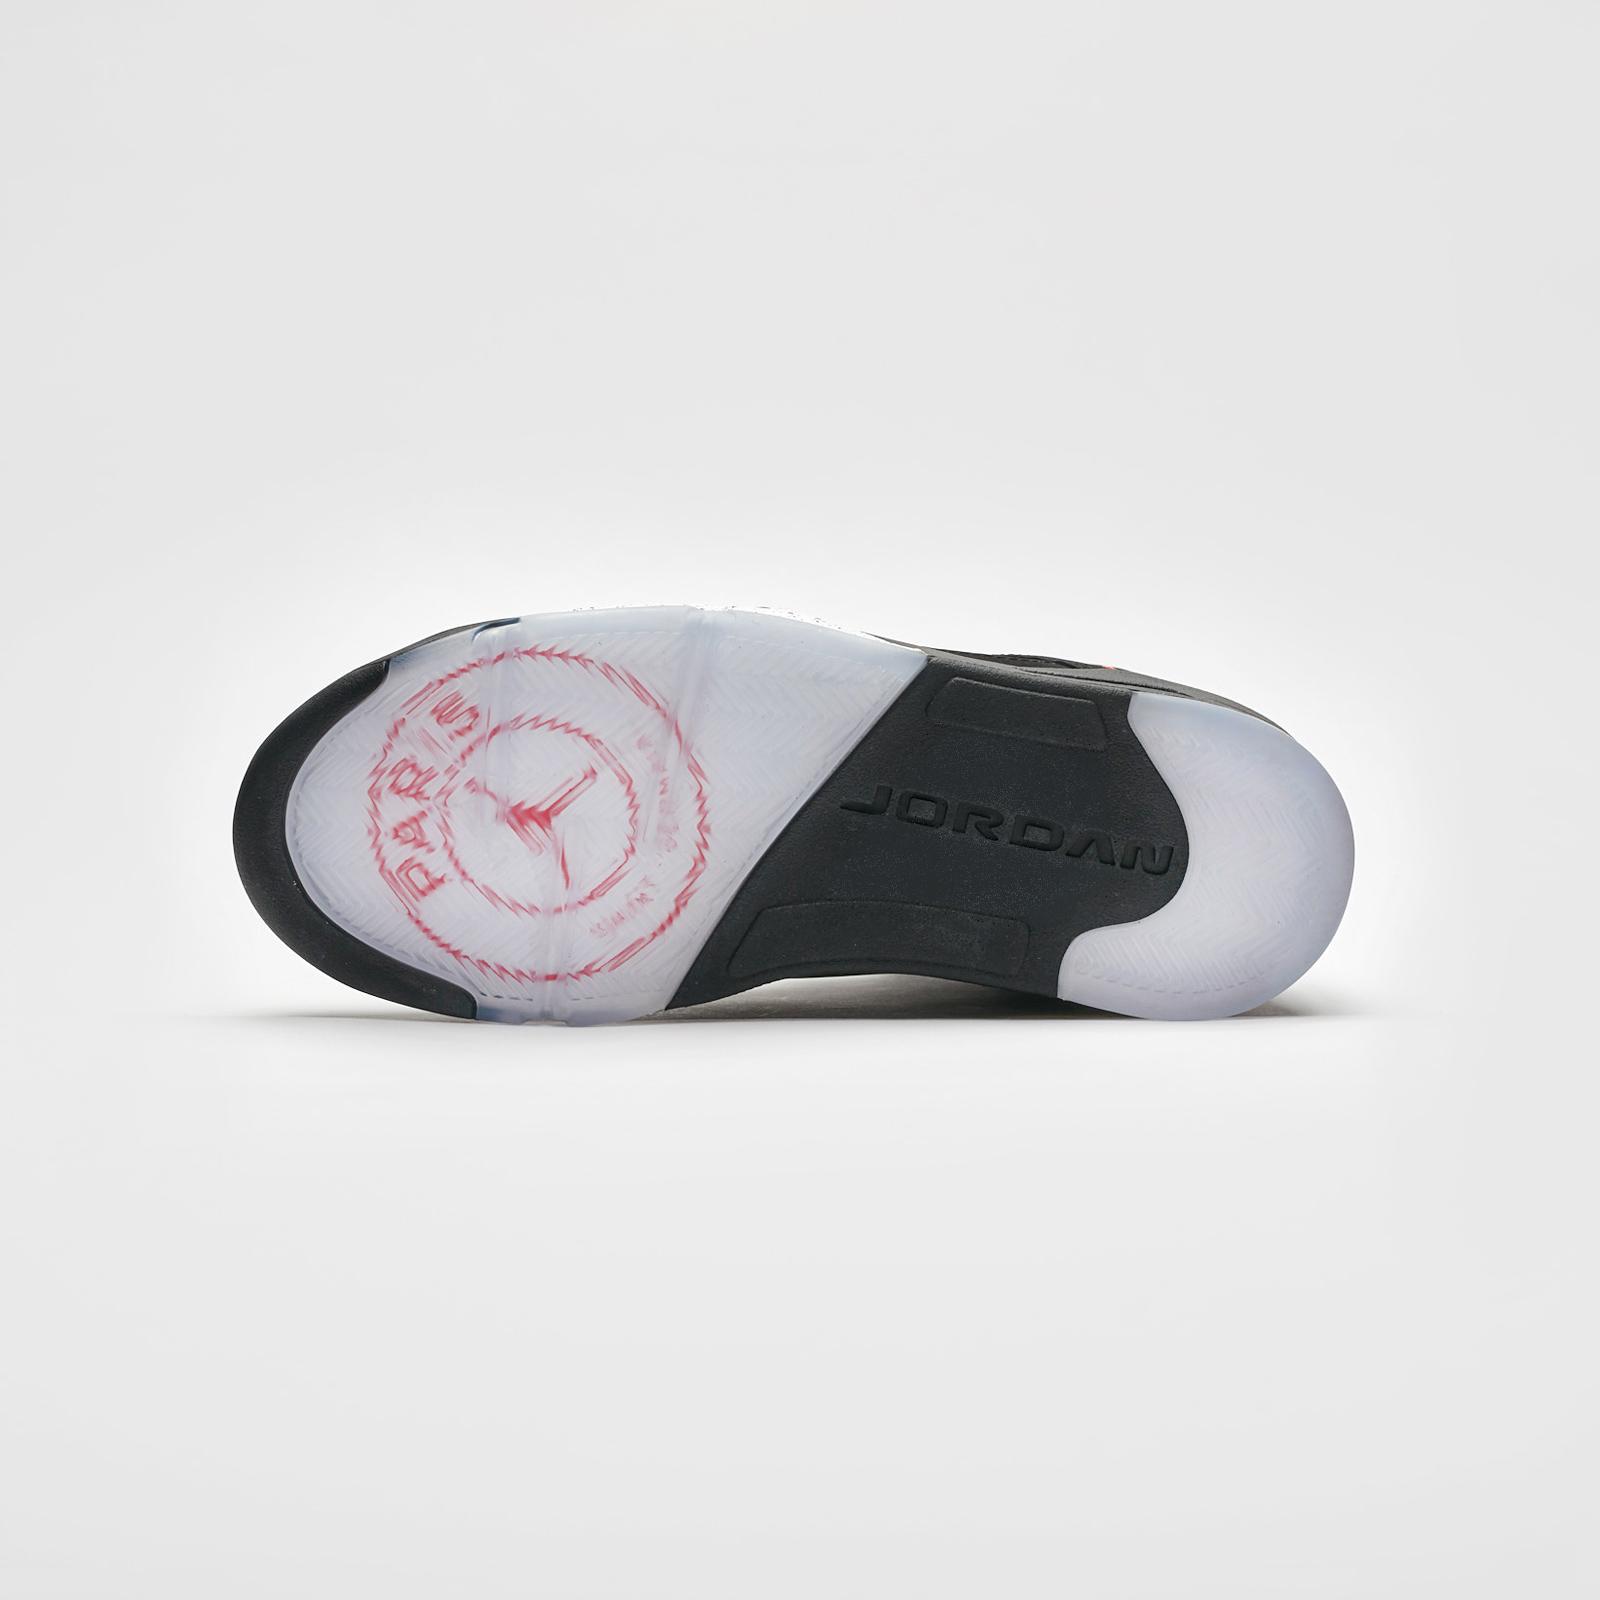 check out 84a0d 5f766 Jordan Brand Air Jordan 5 Retro BCFC - 7. Close